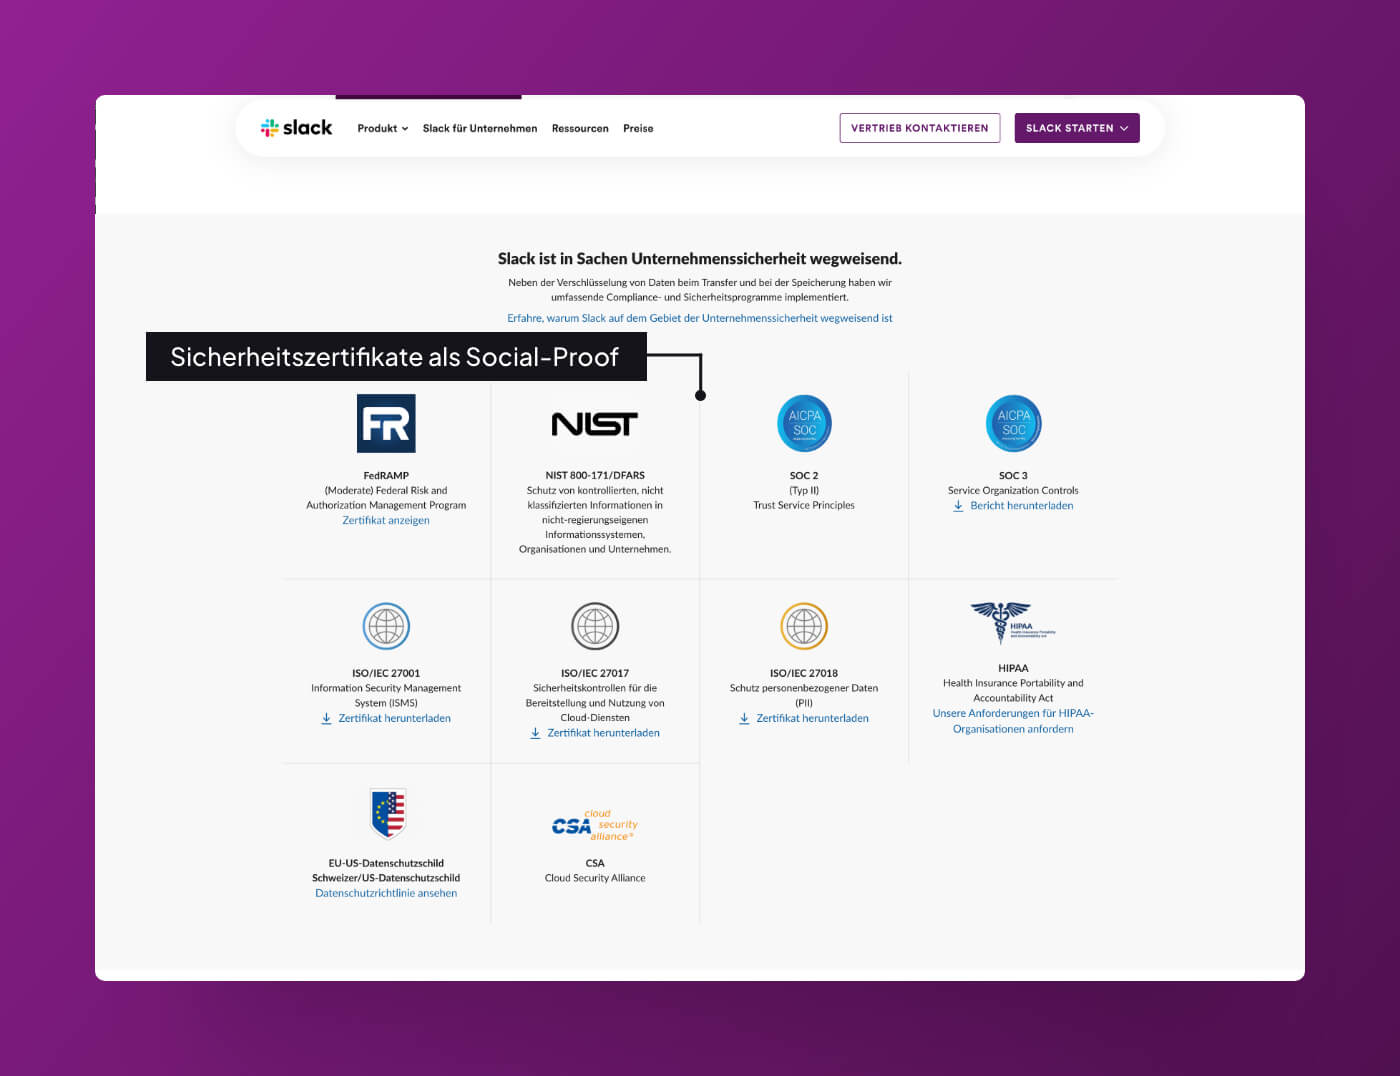 Website Screenshot of Slack.com which shows security certificates.